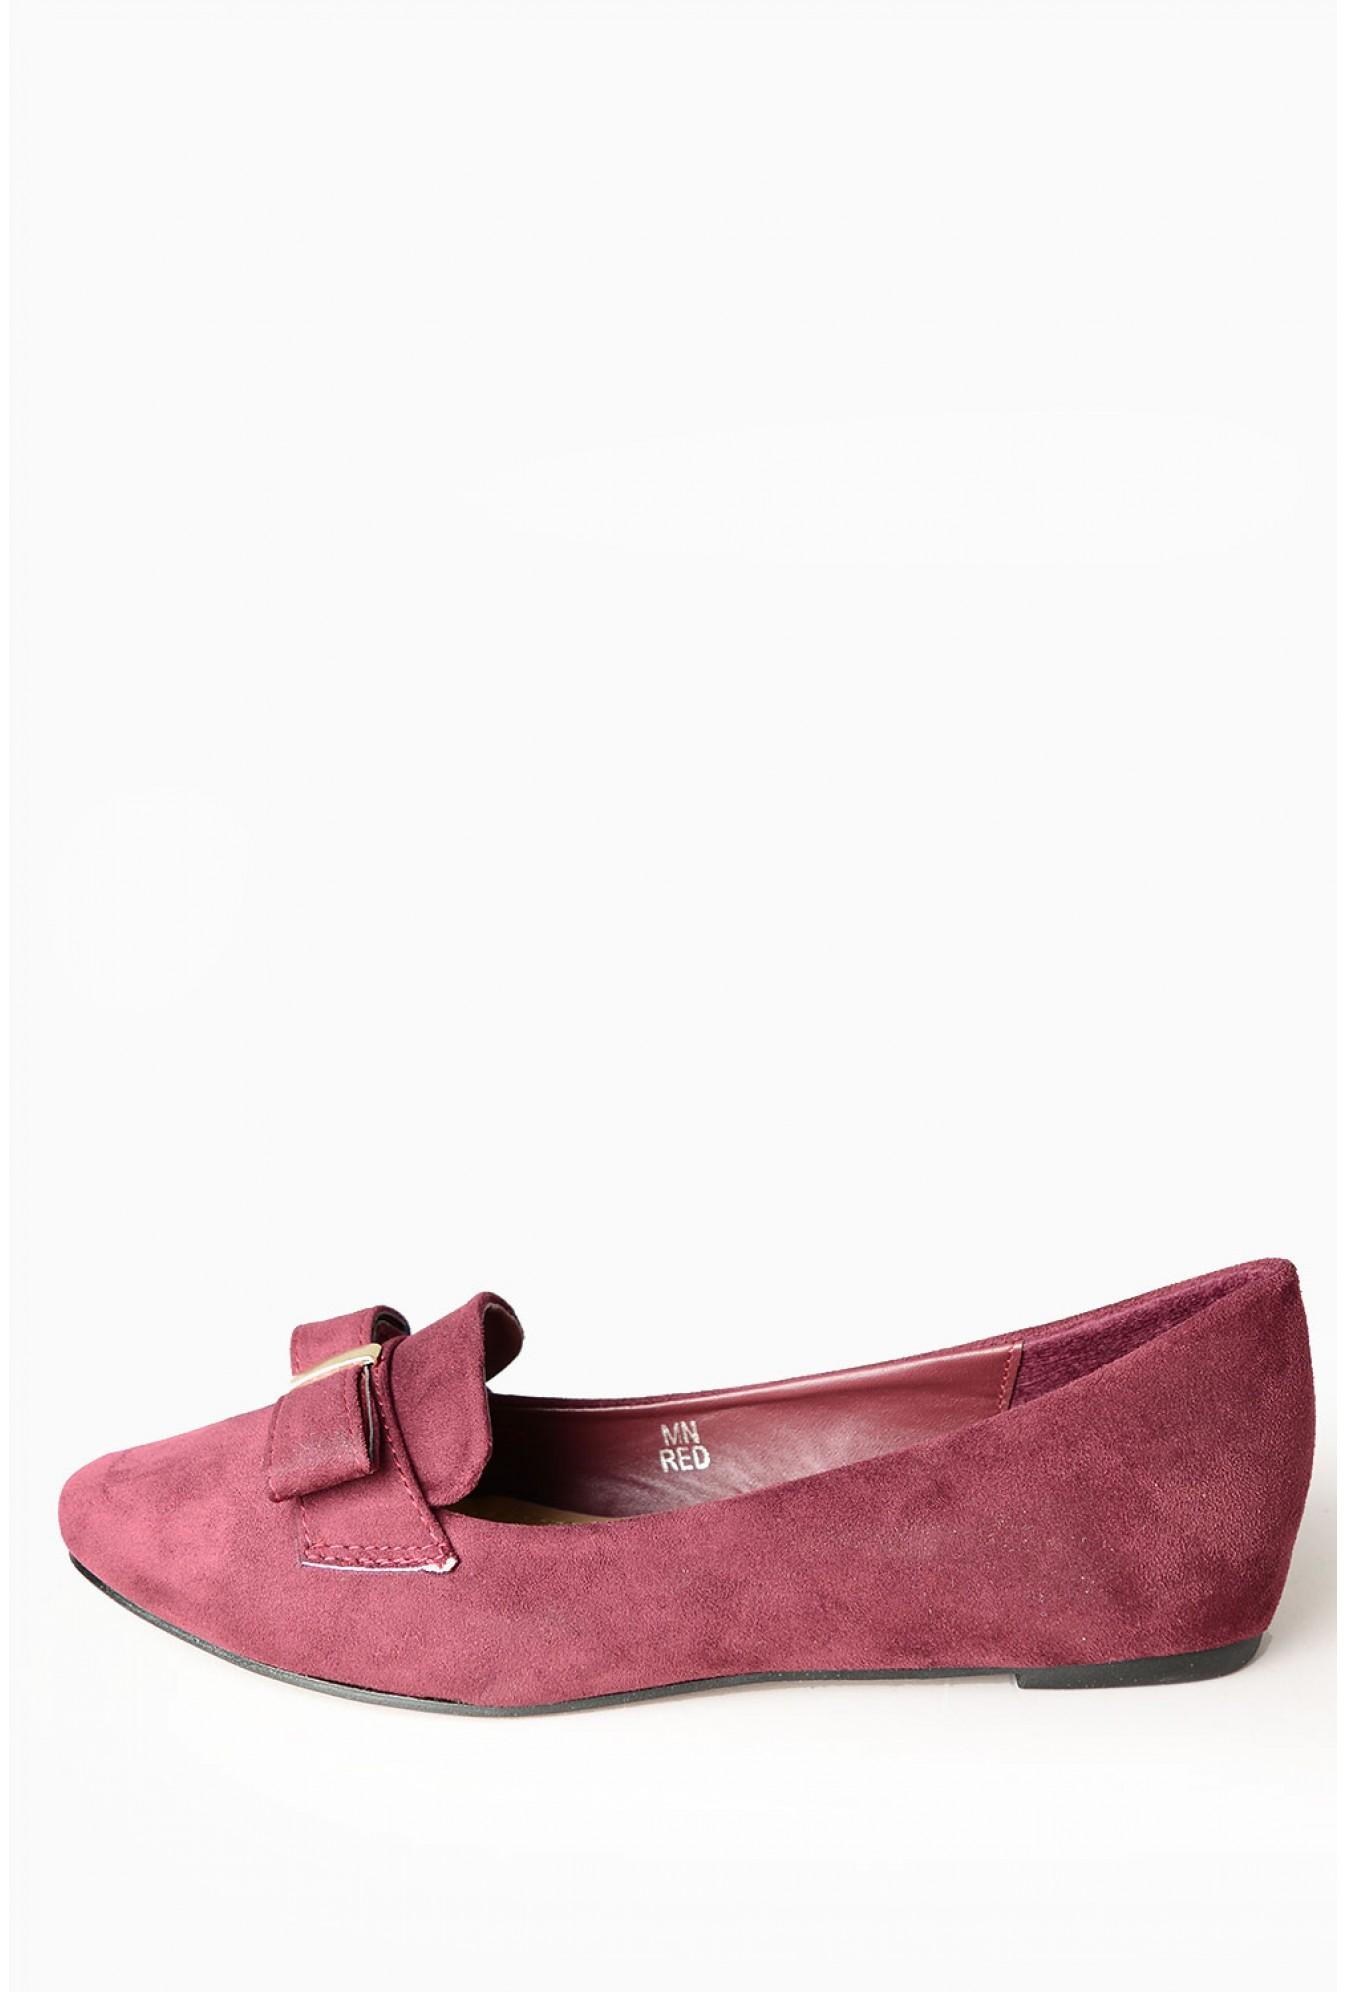 f2d9fc9eacdd More Views. Jaida Bow Flat Shoes in Burgundy